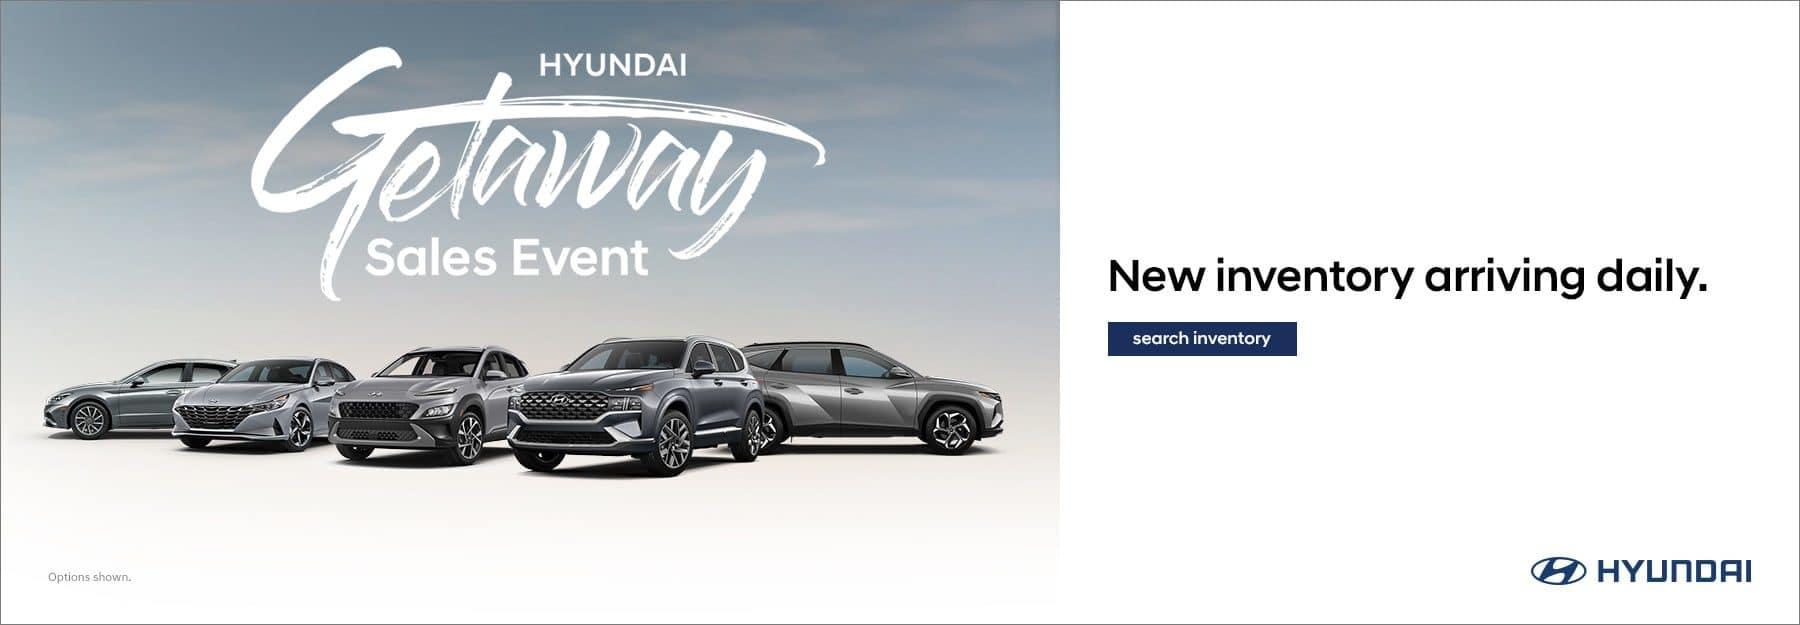 Hyundai Getaway Sales Event